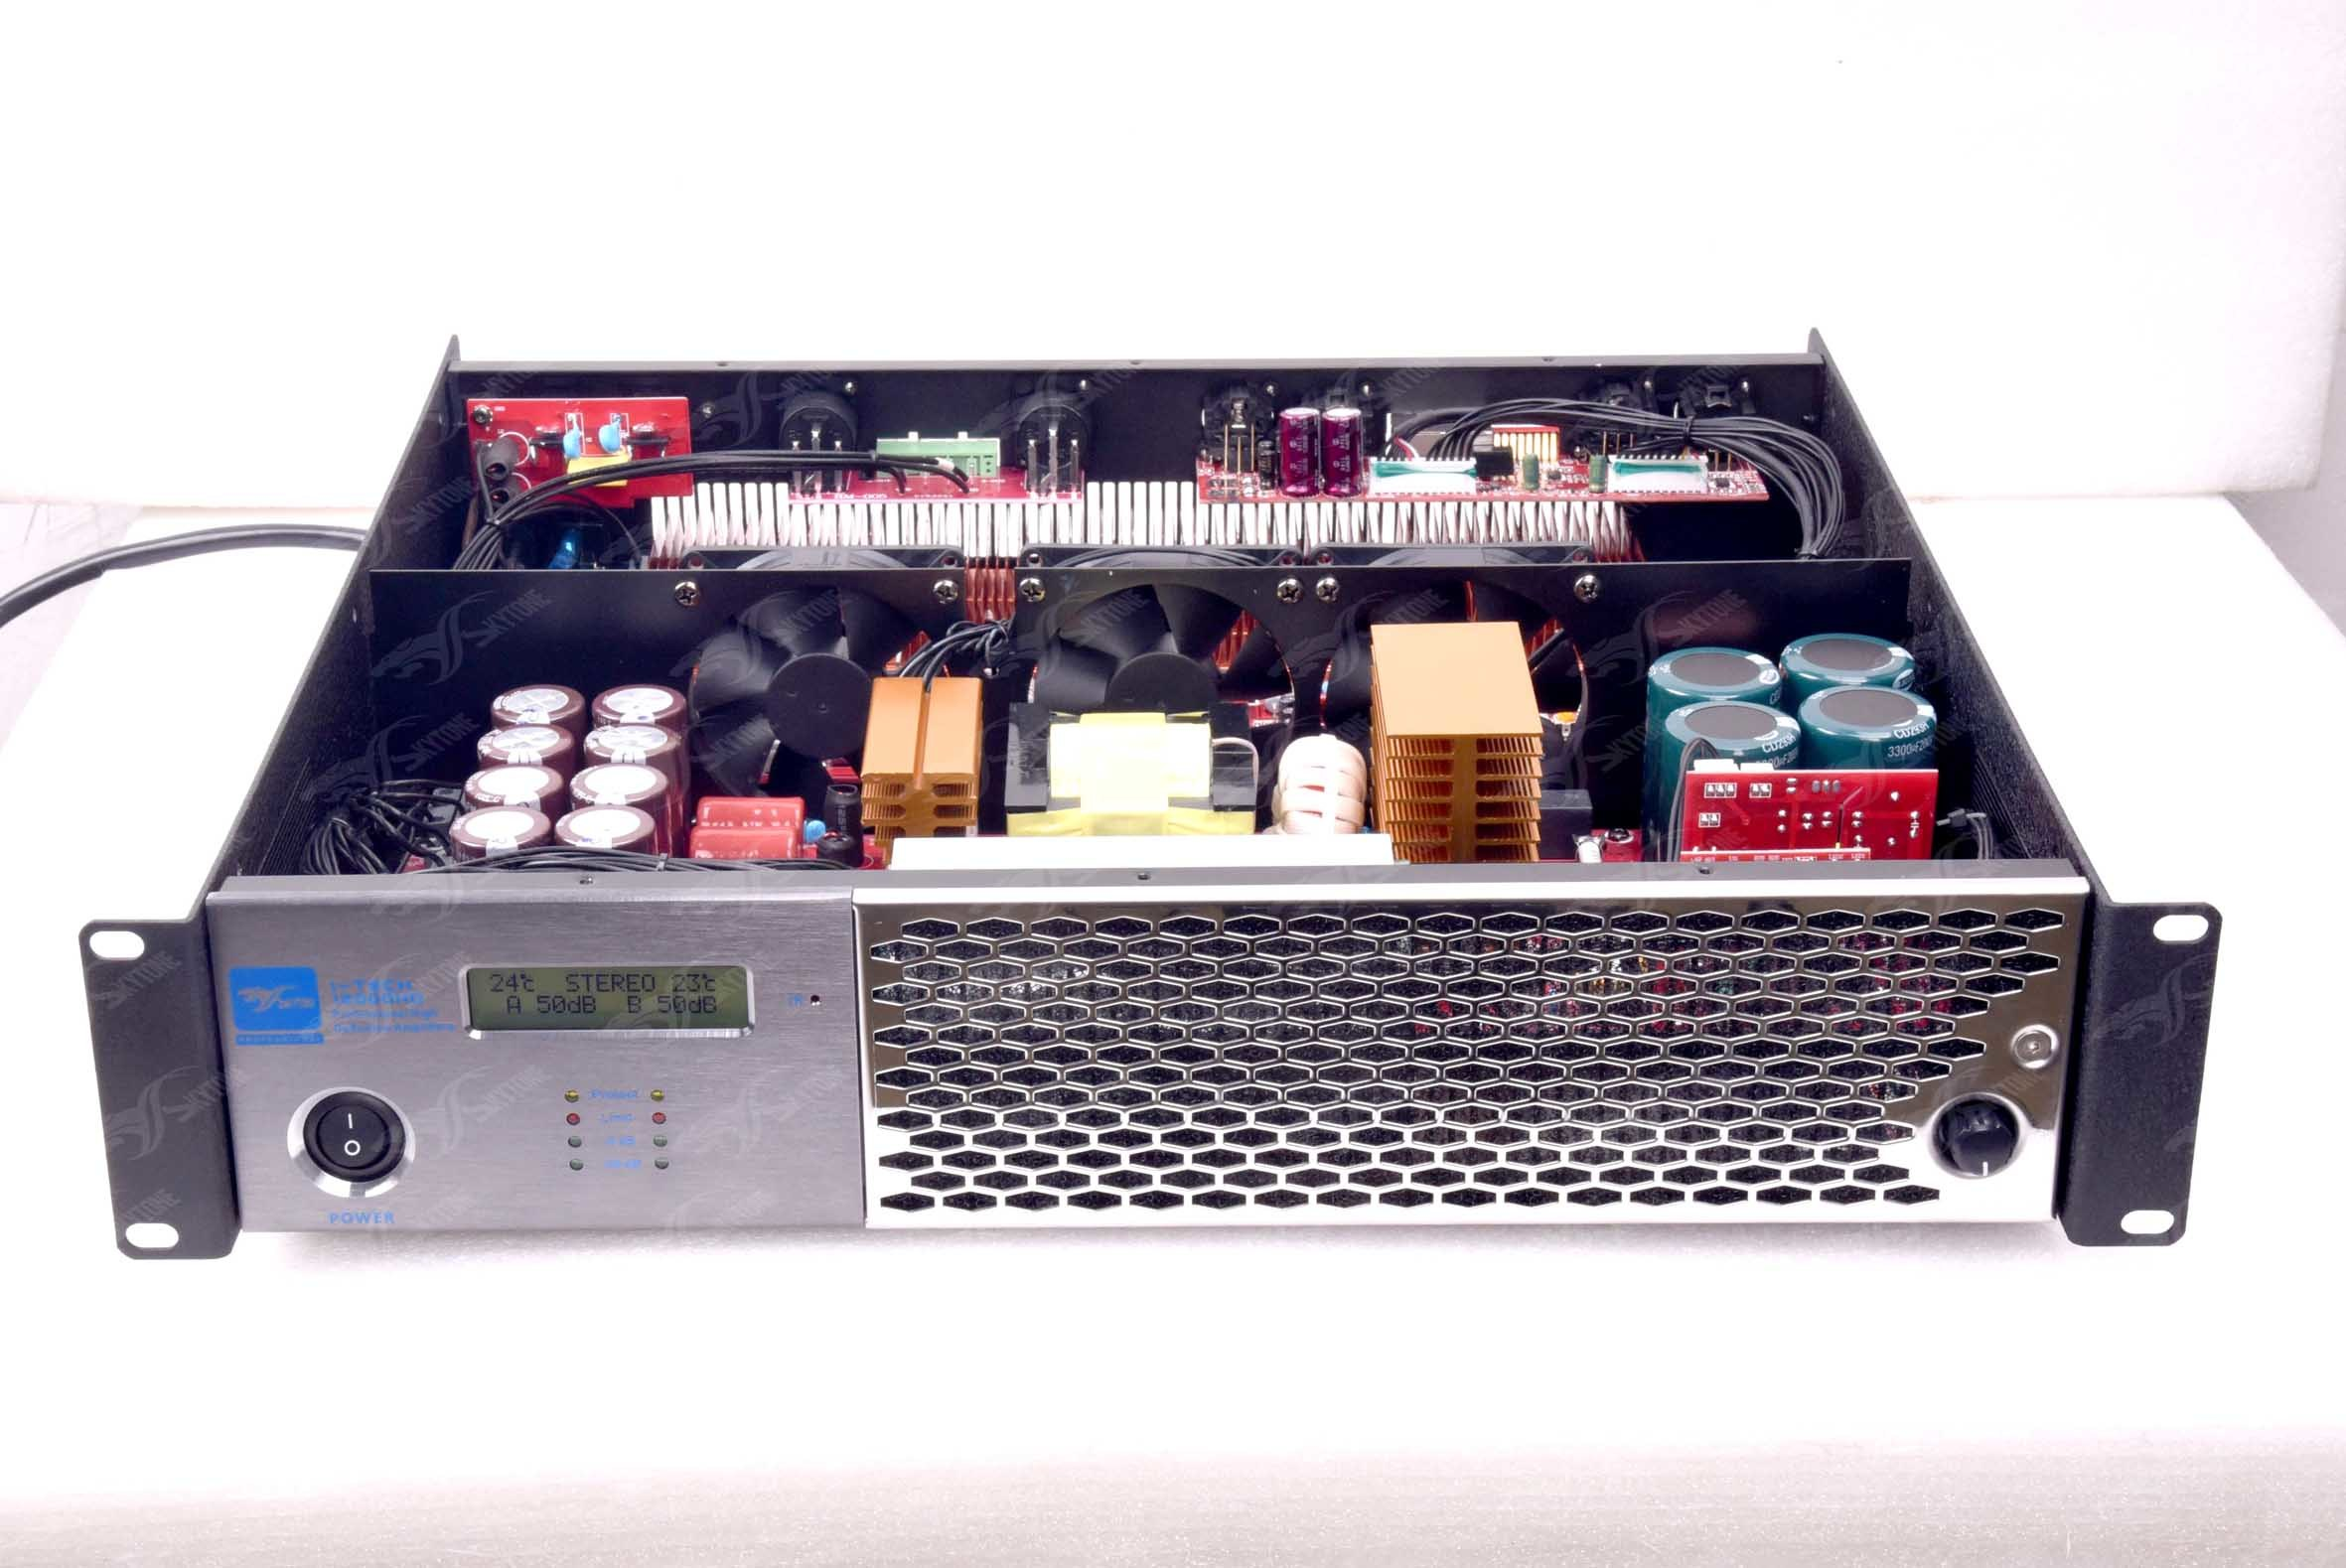 I-Tech12000 Class HD Extreme Professional High Power Amplifier